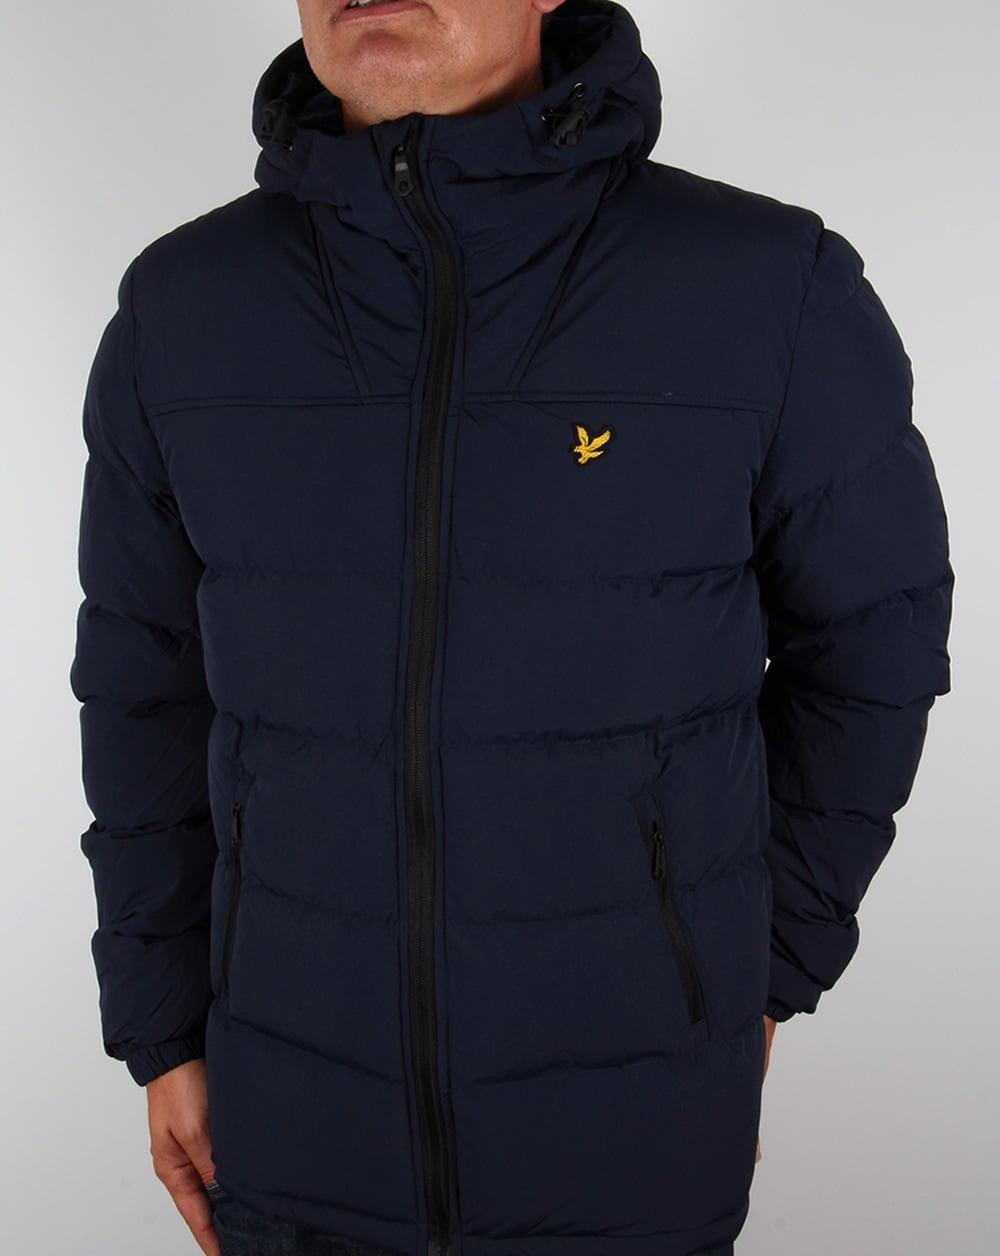 lyle and scott wadded jacket navy coat parka mens puffa padded winter. Black Bedroom Furniture Sets. Home Design Ideas